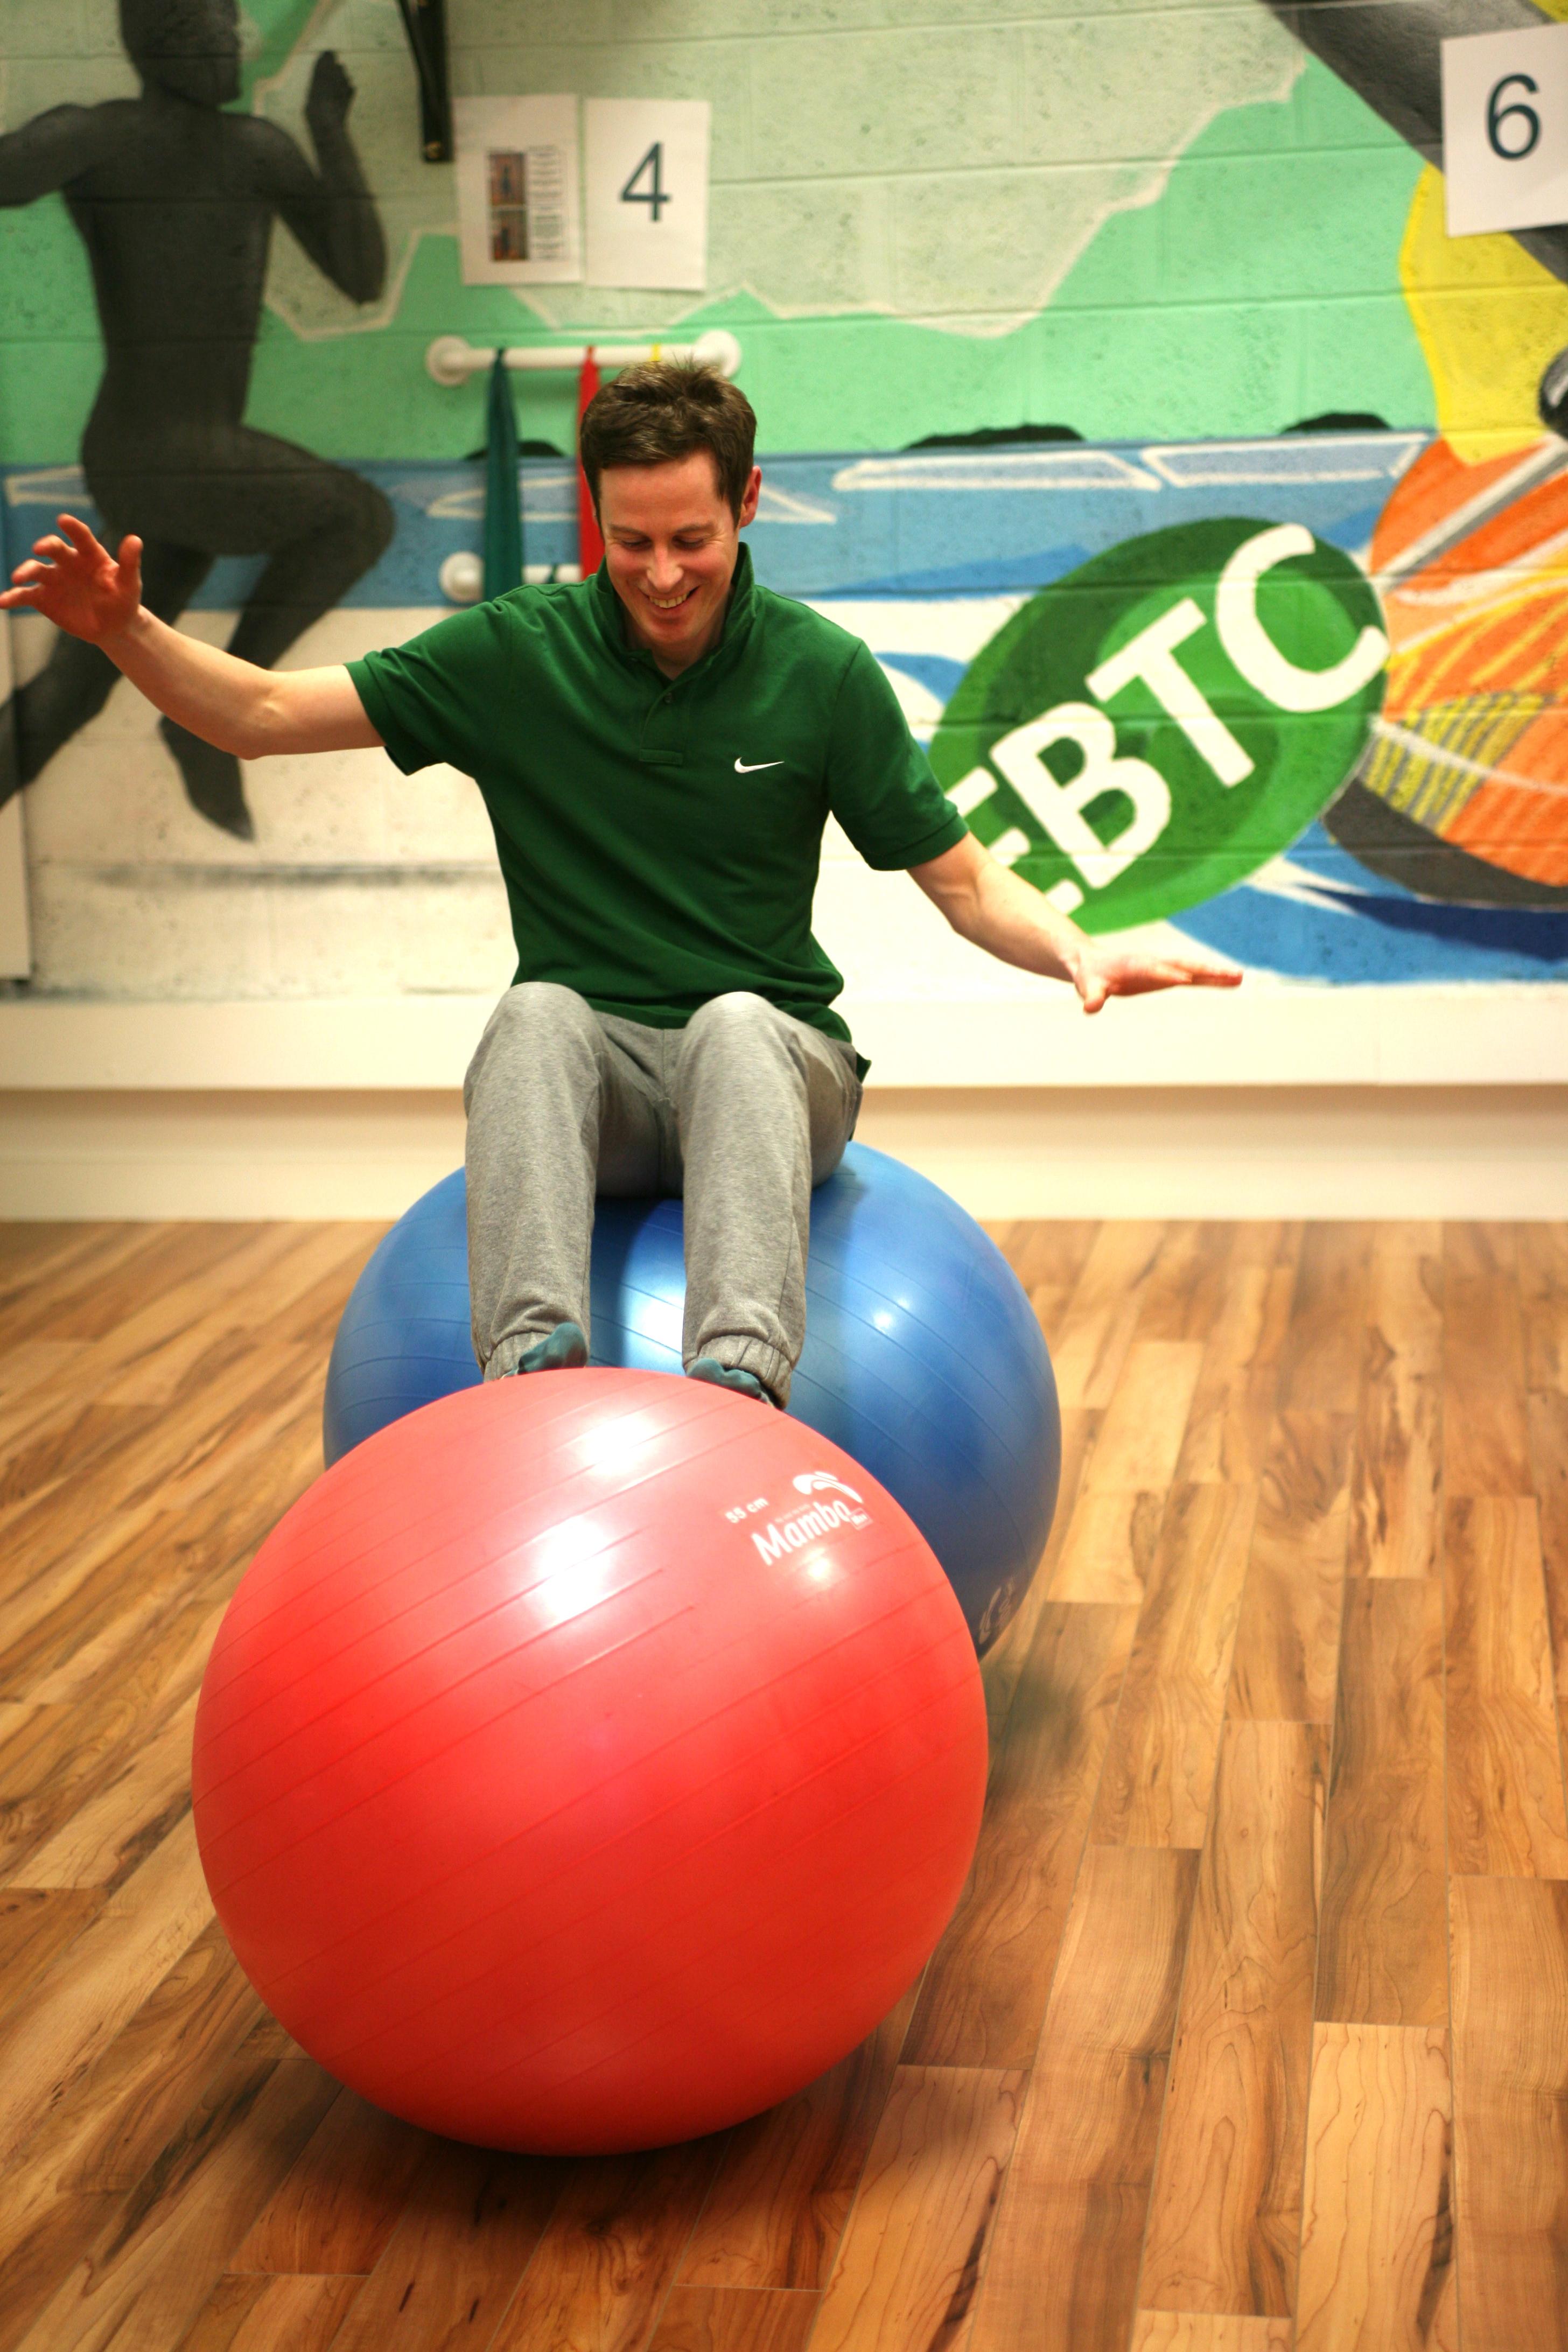 2-ball balance test